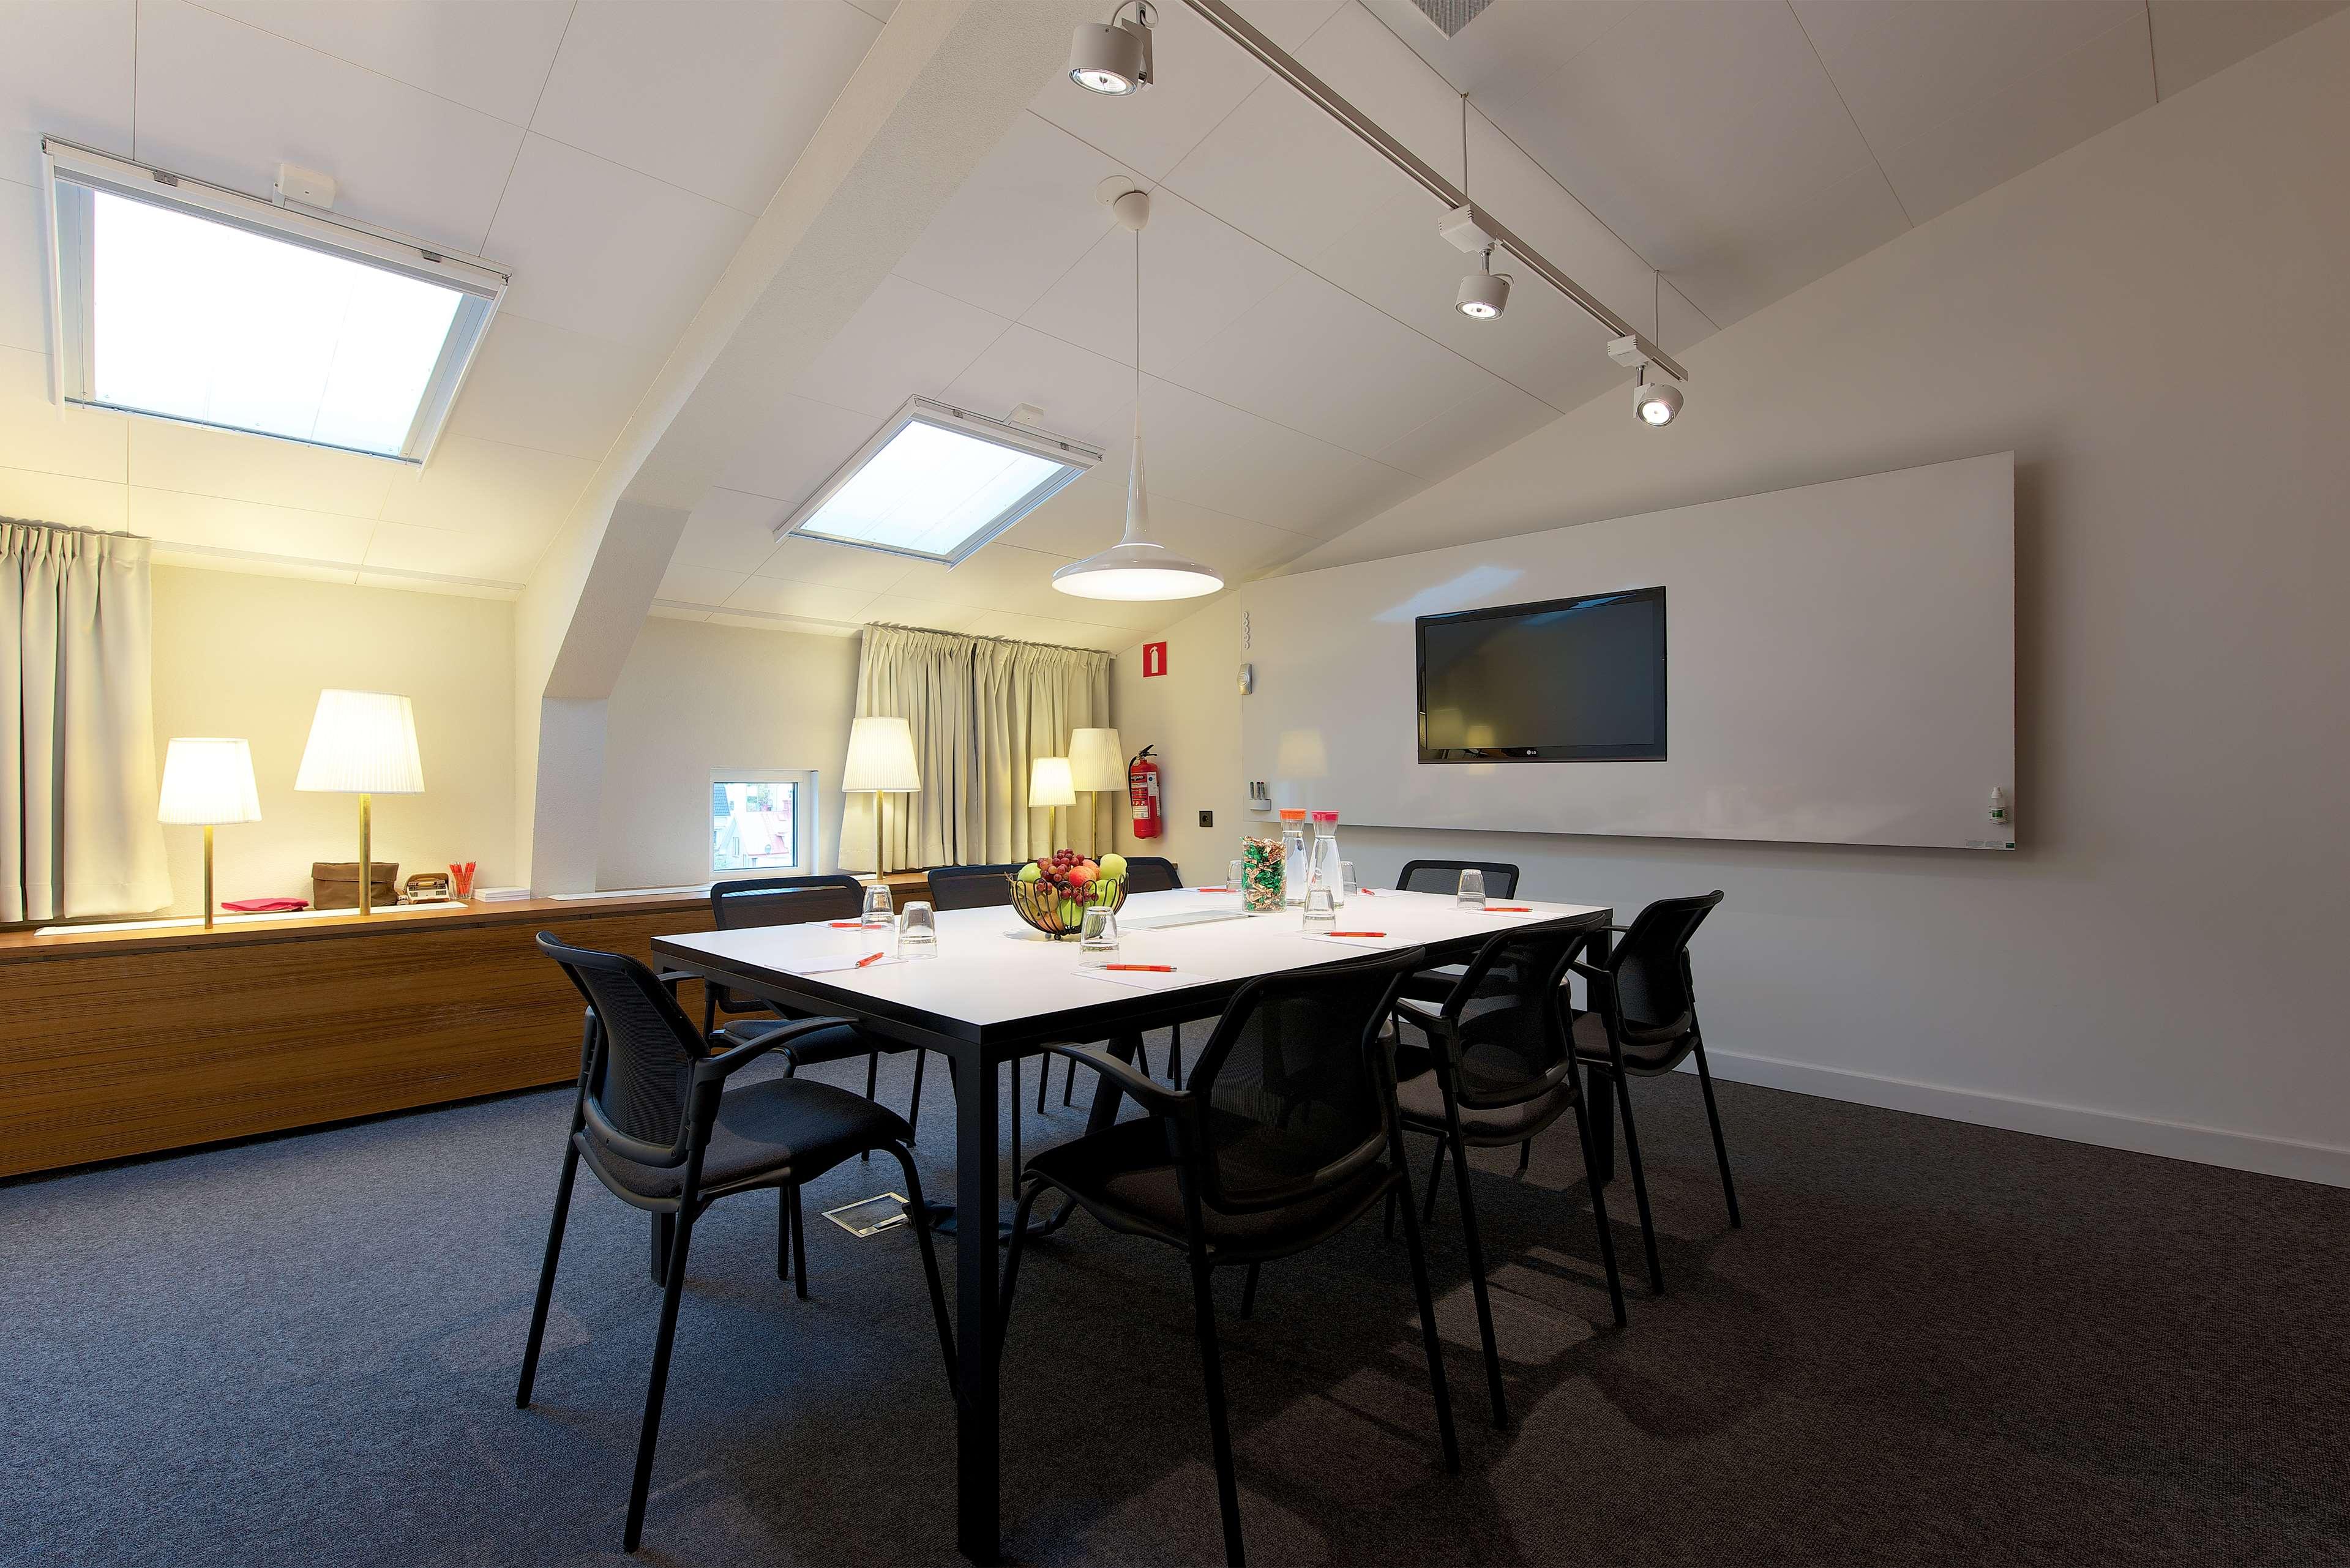 Learjet Meeting Room